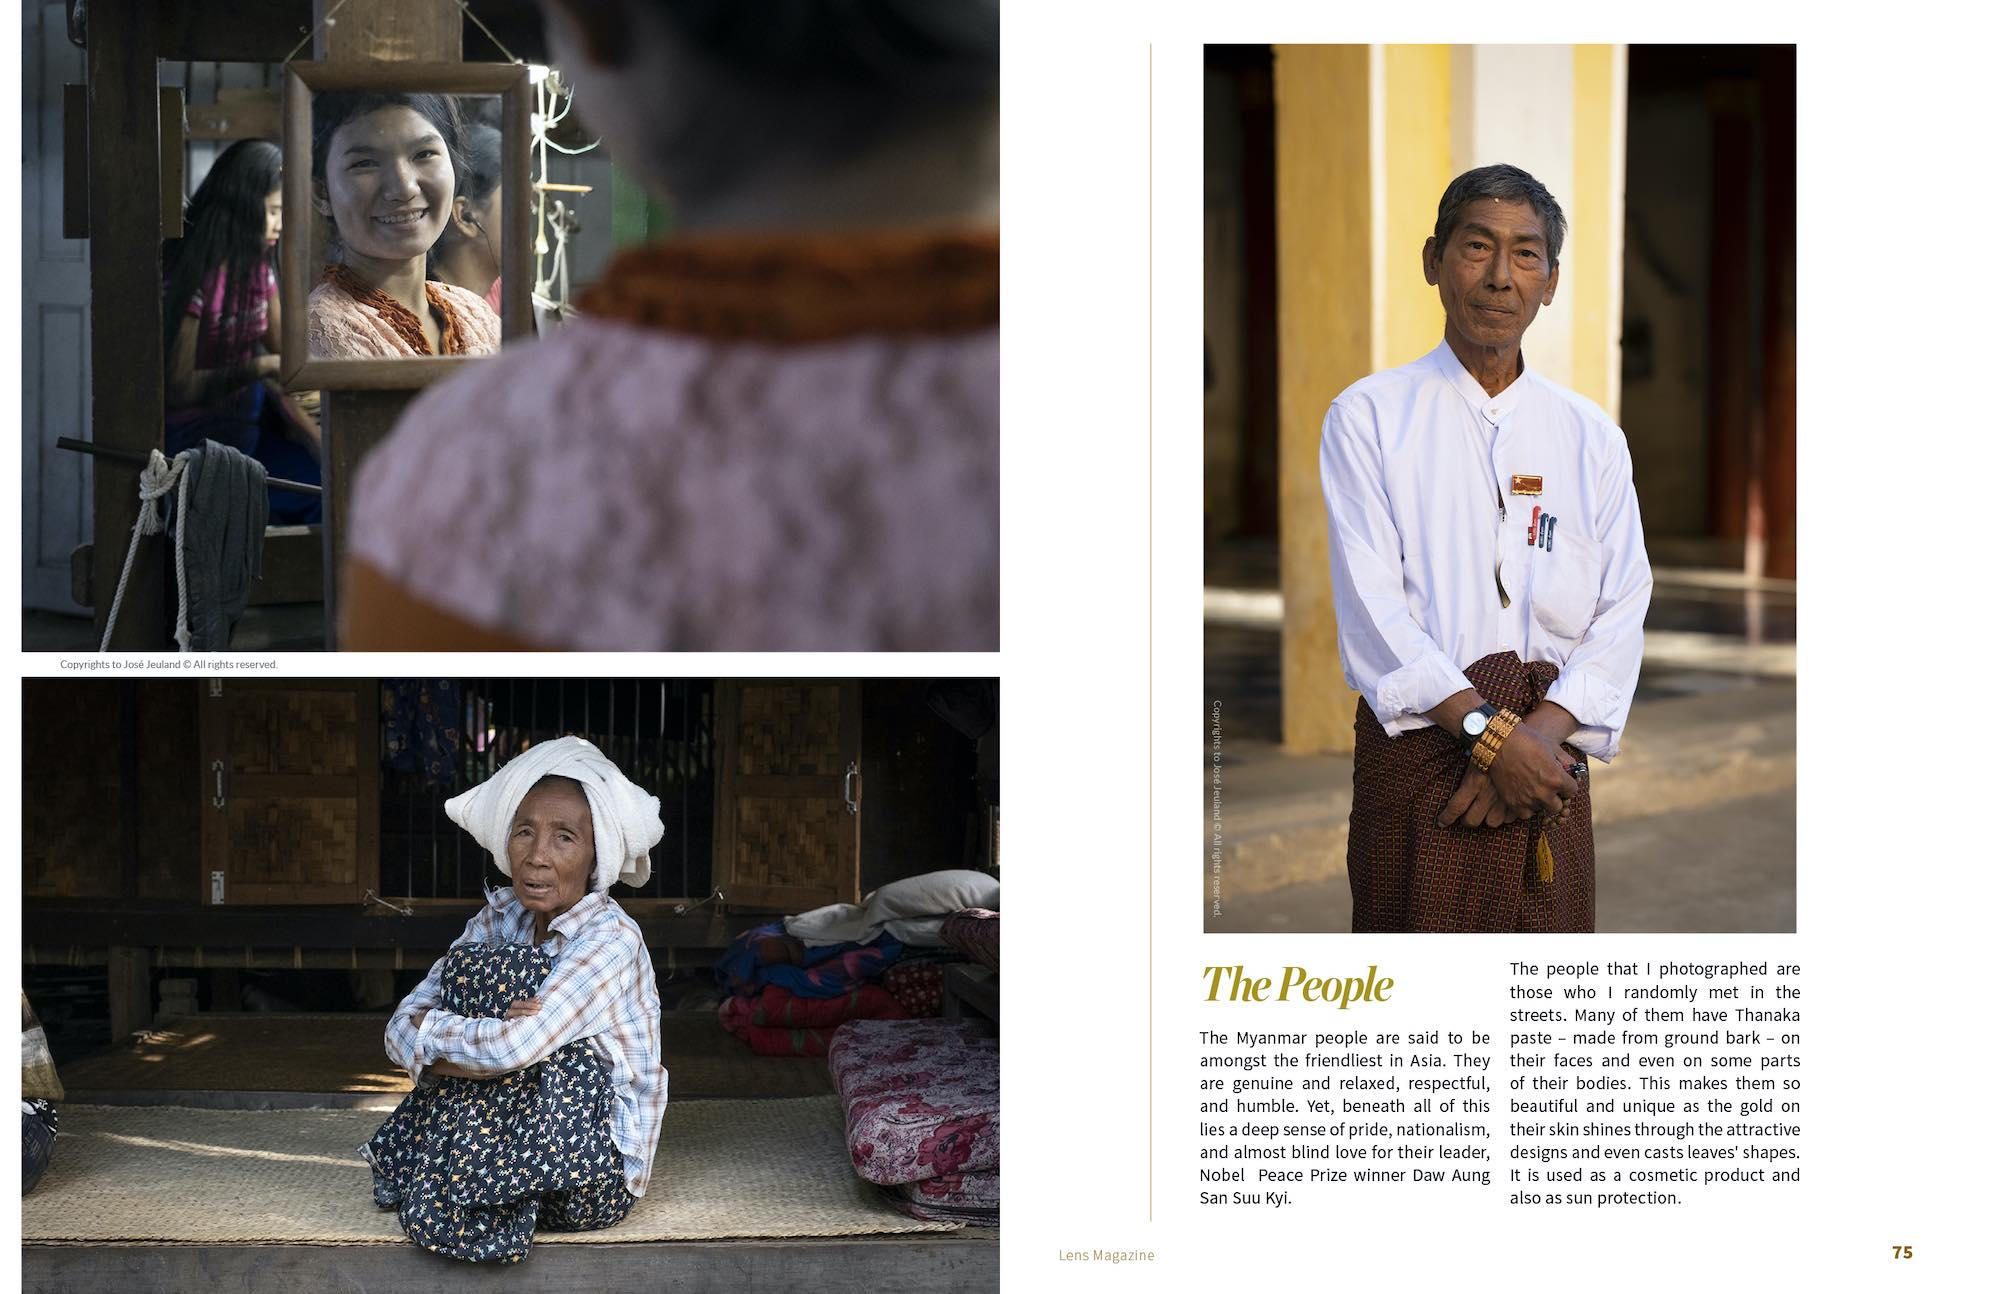 Lens Magazine_74_38 Golden Land Myanmar travel photography photographer